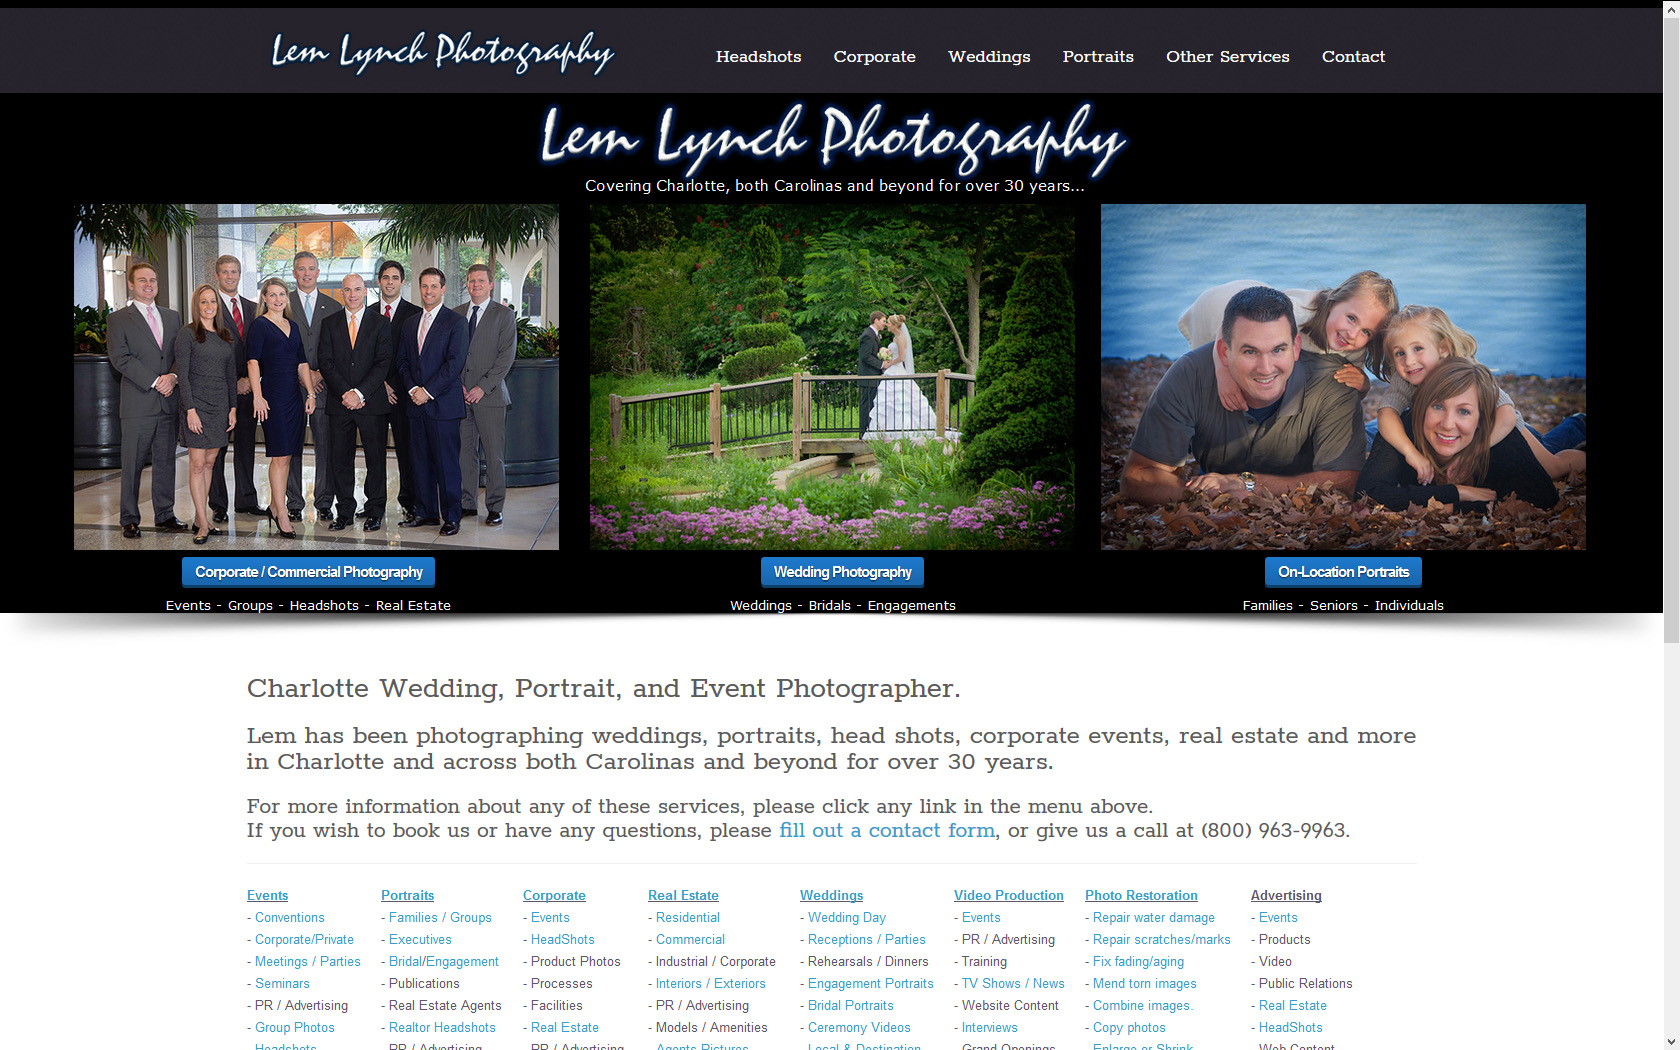 Lem Lynch Photography